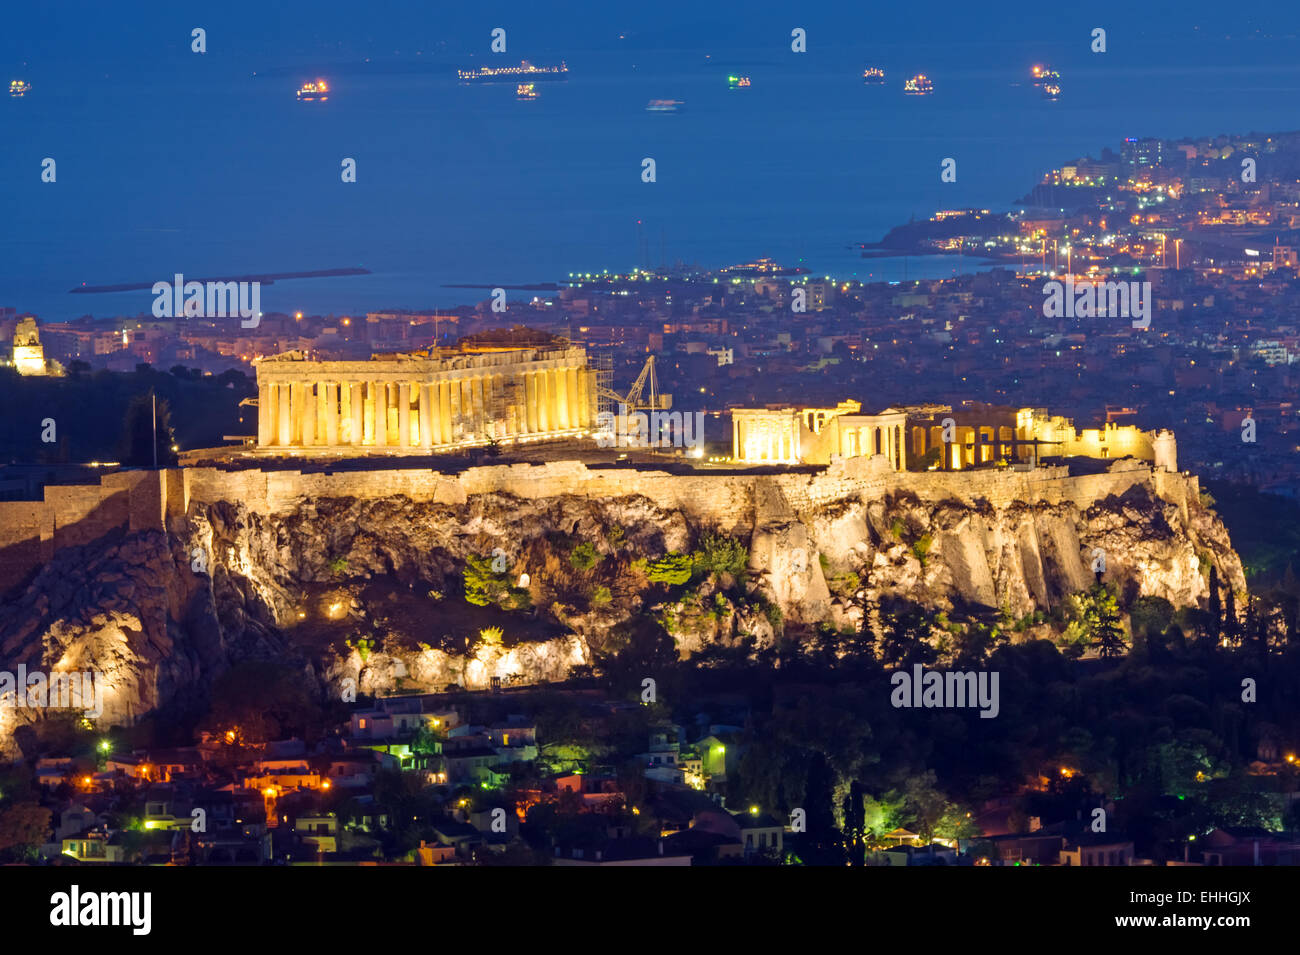 The Acropolis at night Stock Photo